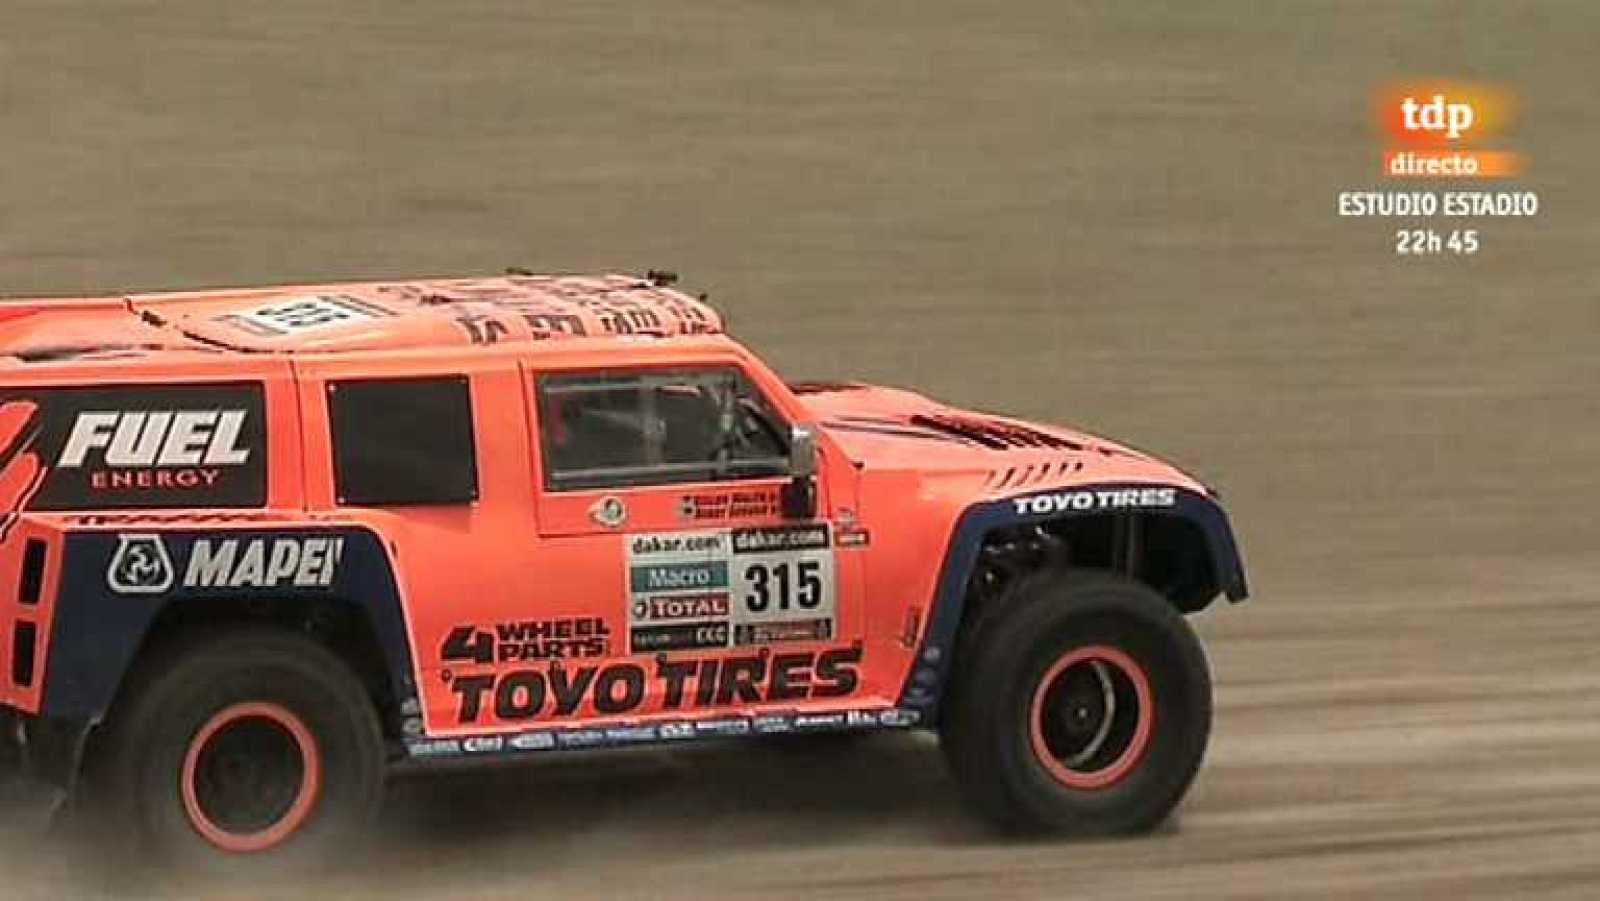 Rally Dakar 2013 - Etapa 8 (Salta - San Miguel de Tucumán) - 11/01/13 - Ver ahora